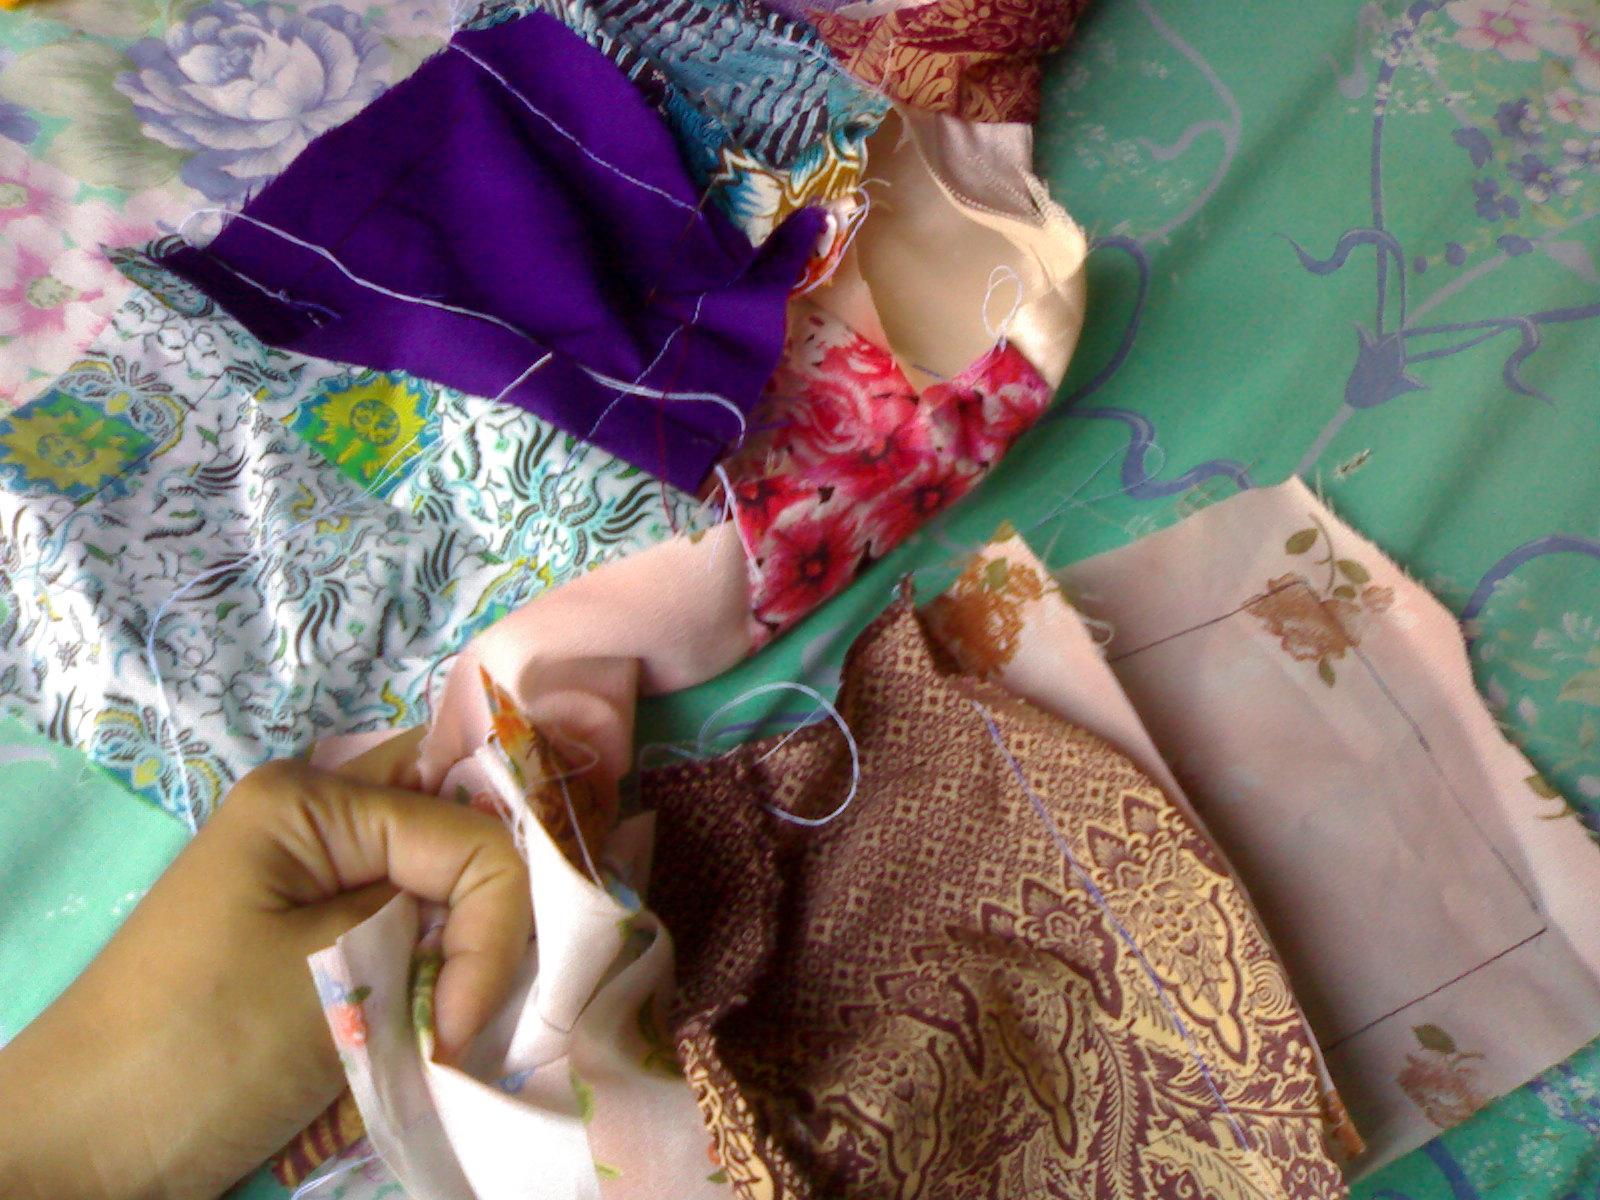 pertama gunting kain perca warna warni dalam 1 ukuran.